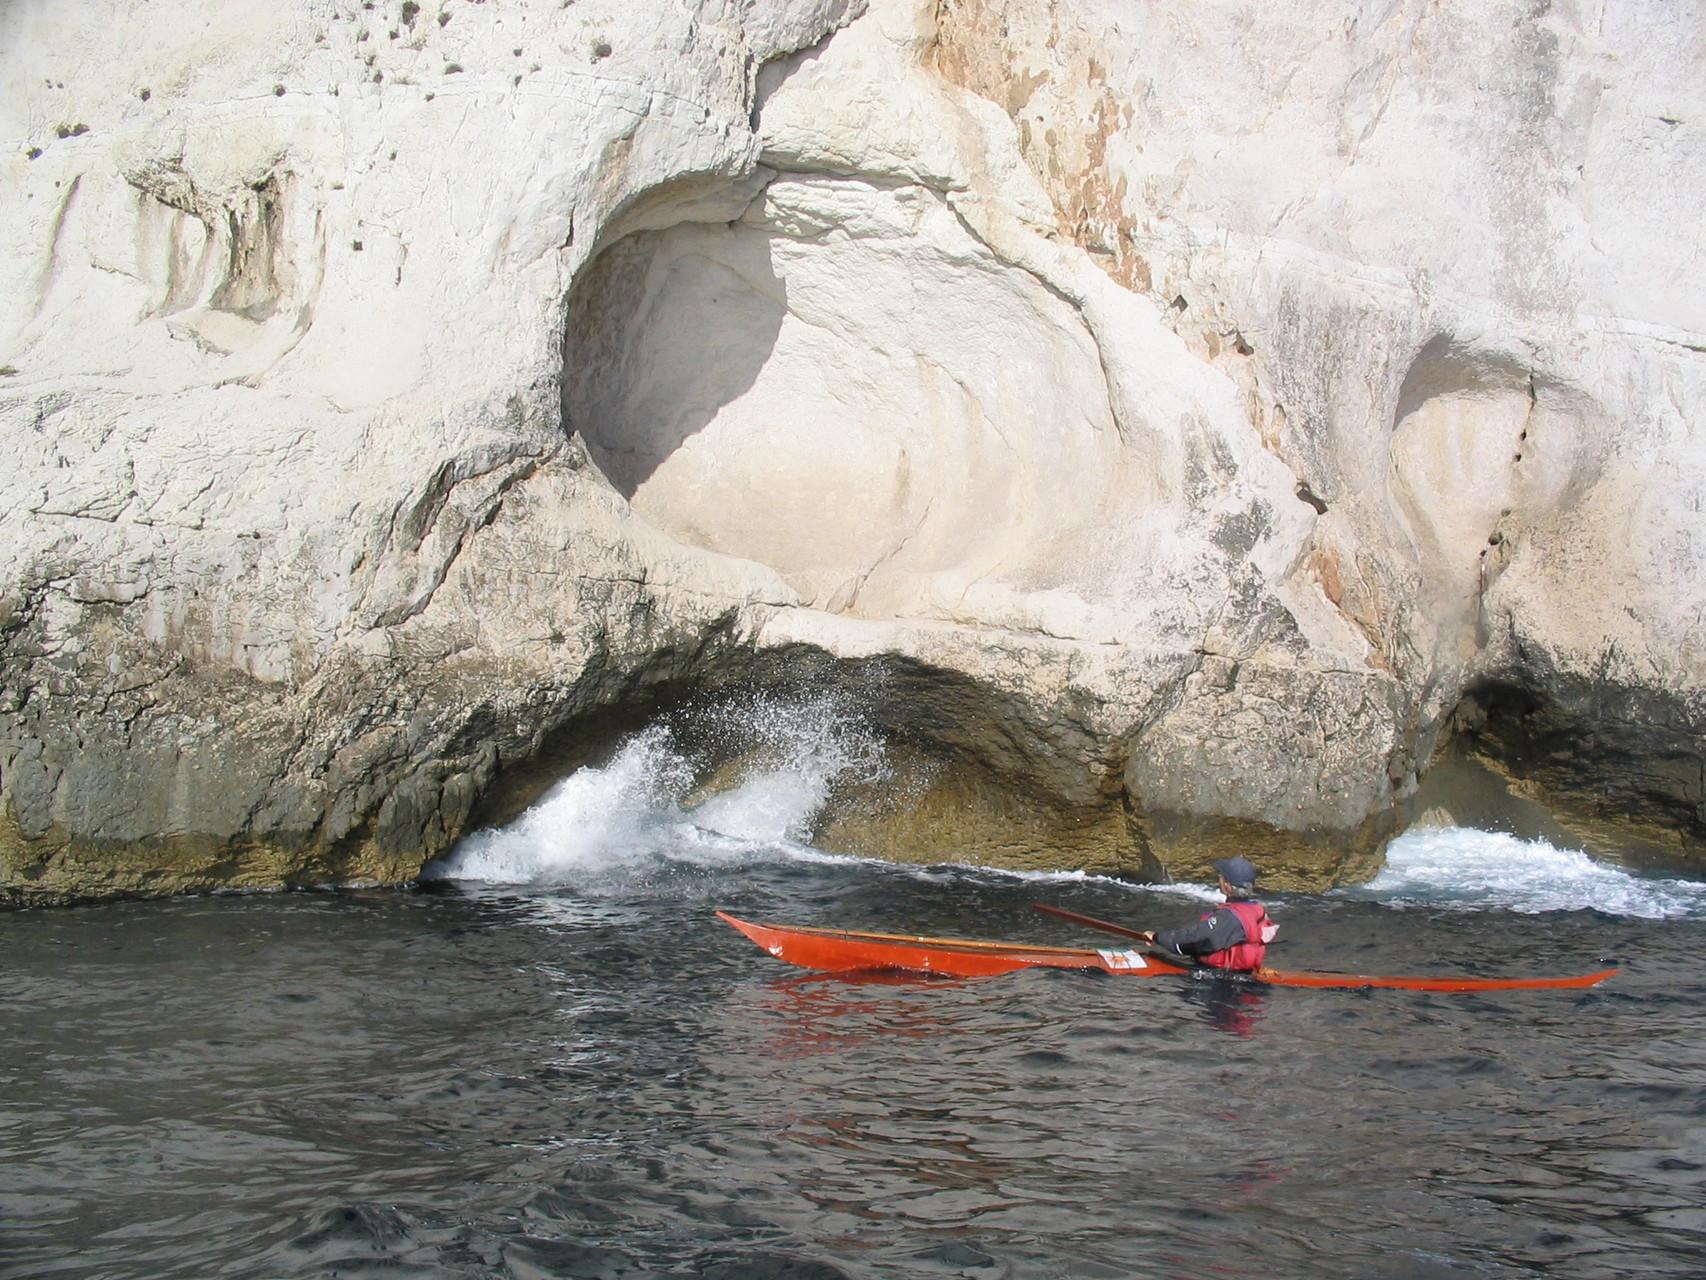 kayak groenlandais, Calanques